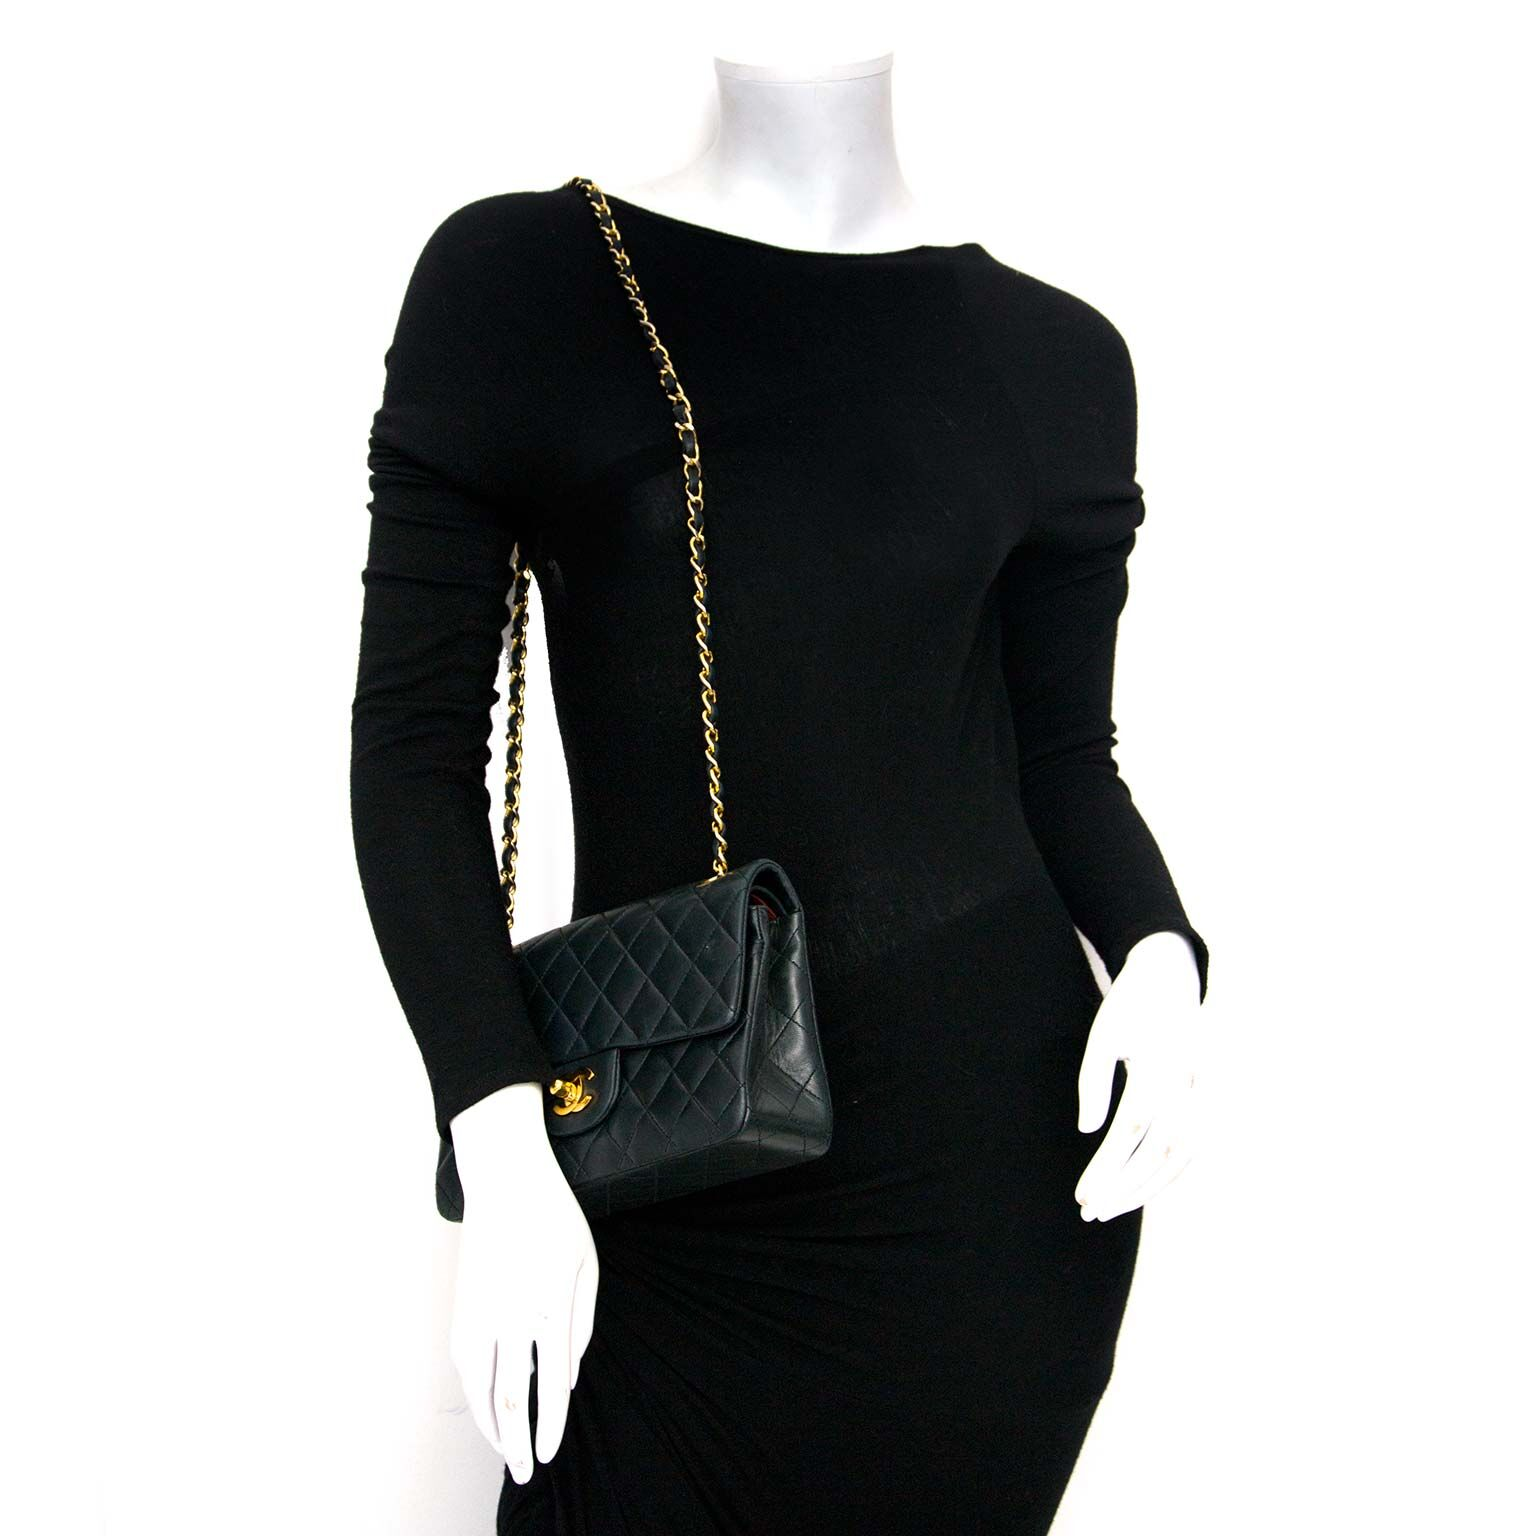 authentic chanel double flap bag for sale